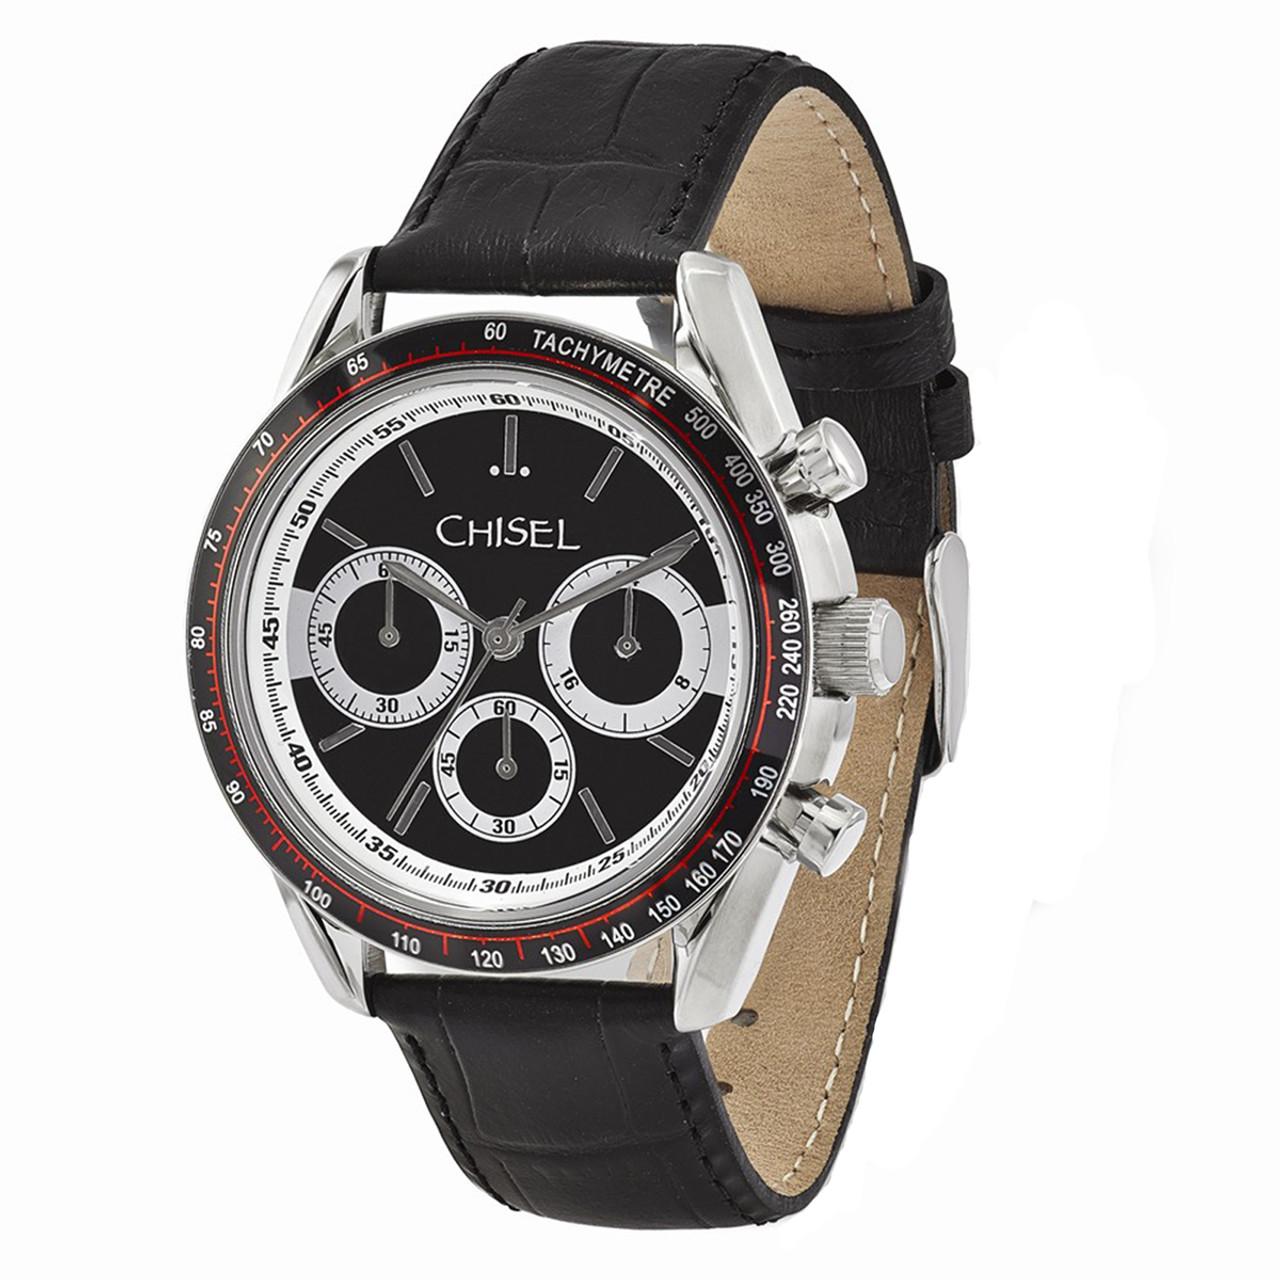 0acbdb54c Chisel Chronograph Tachymeter Quartz Black Leather Mens Watch TPW105 - The  Royal Gift Inc.